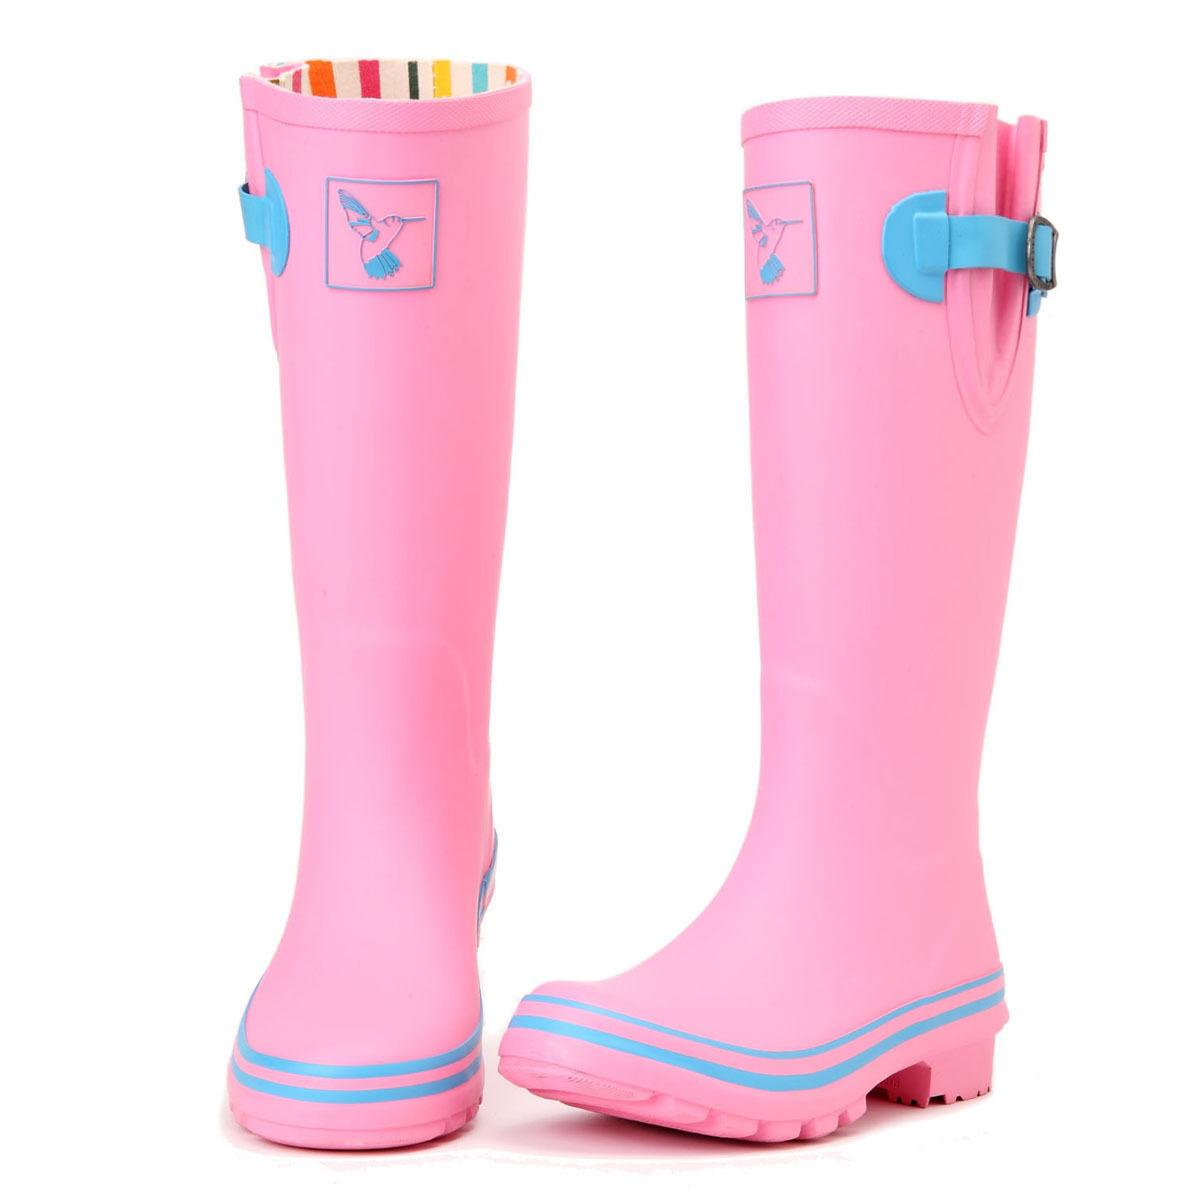 Evercreatures UK Brand Fashion Pink Rubber Rain Boots Women's Wellies